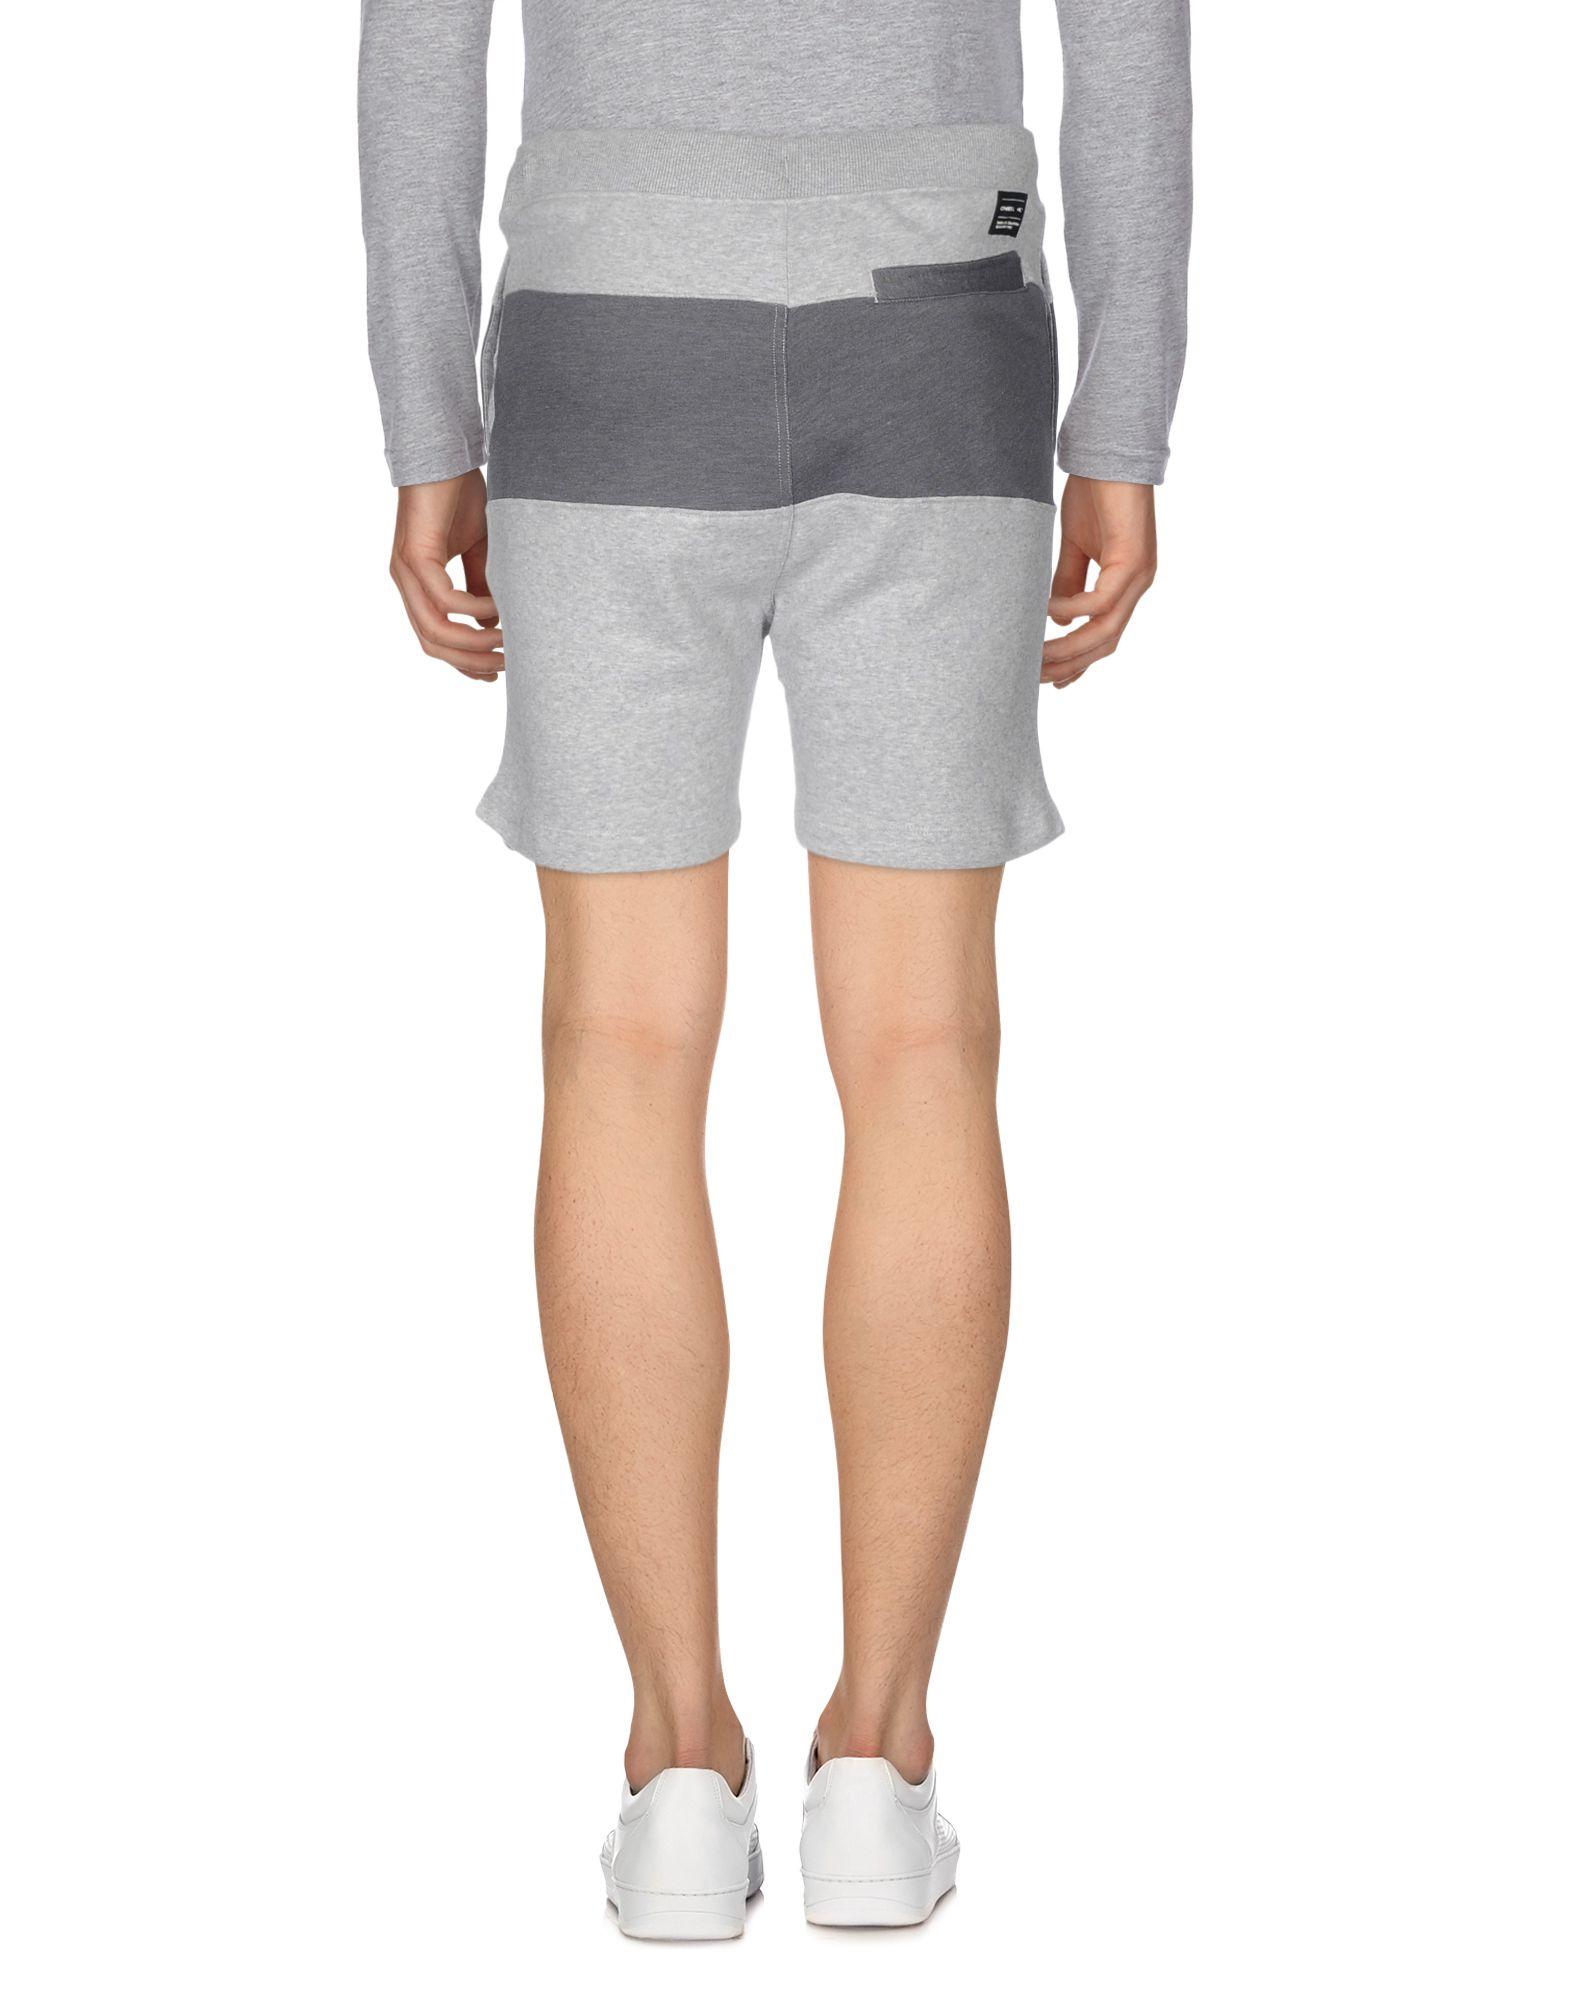 Pantalone Pantalone Pantalone Felpa O'neill Uomo - 13141252RS 1181b3